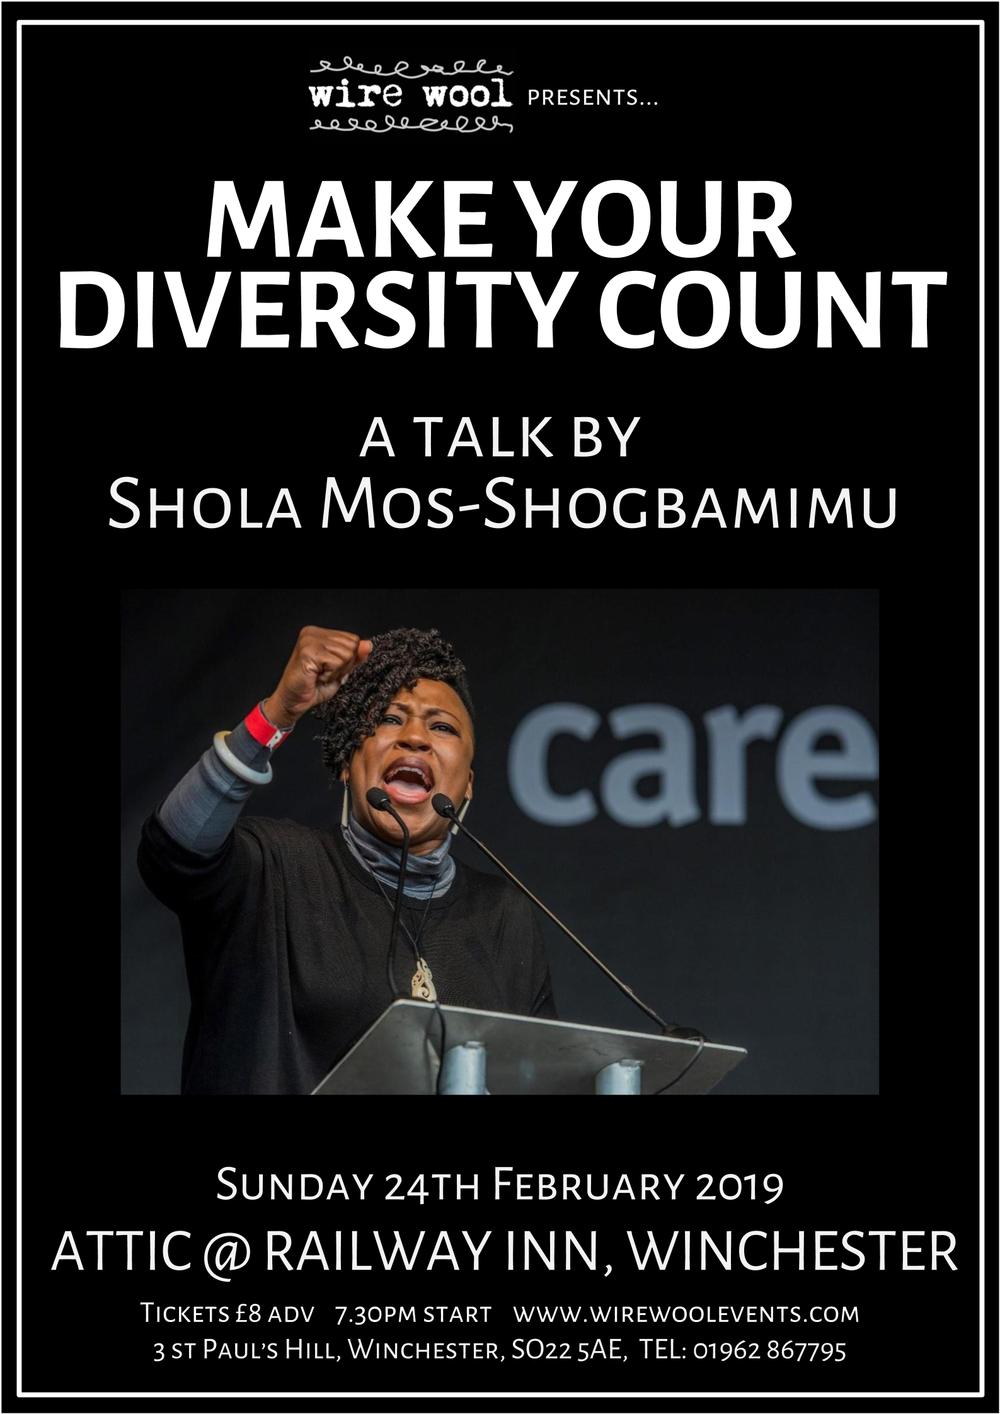 Make Your Diversity Count: a talk by Shola Mos-Shogbamimu Sunday, February 24, 2019